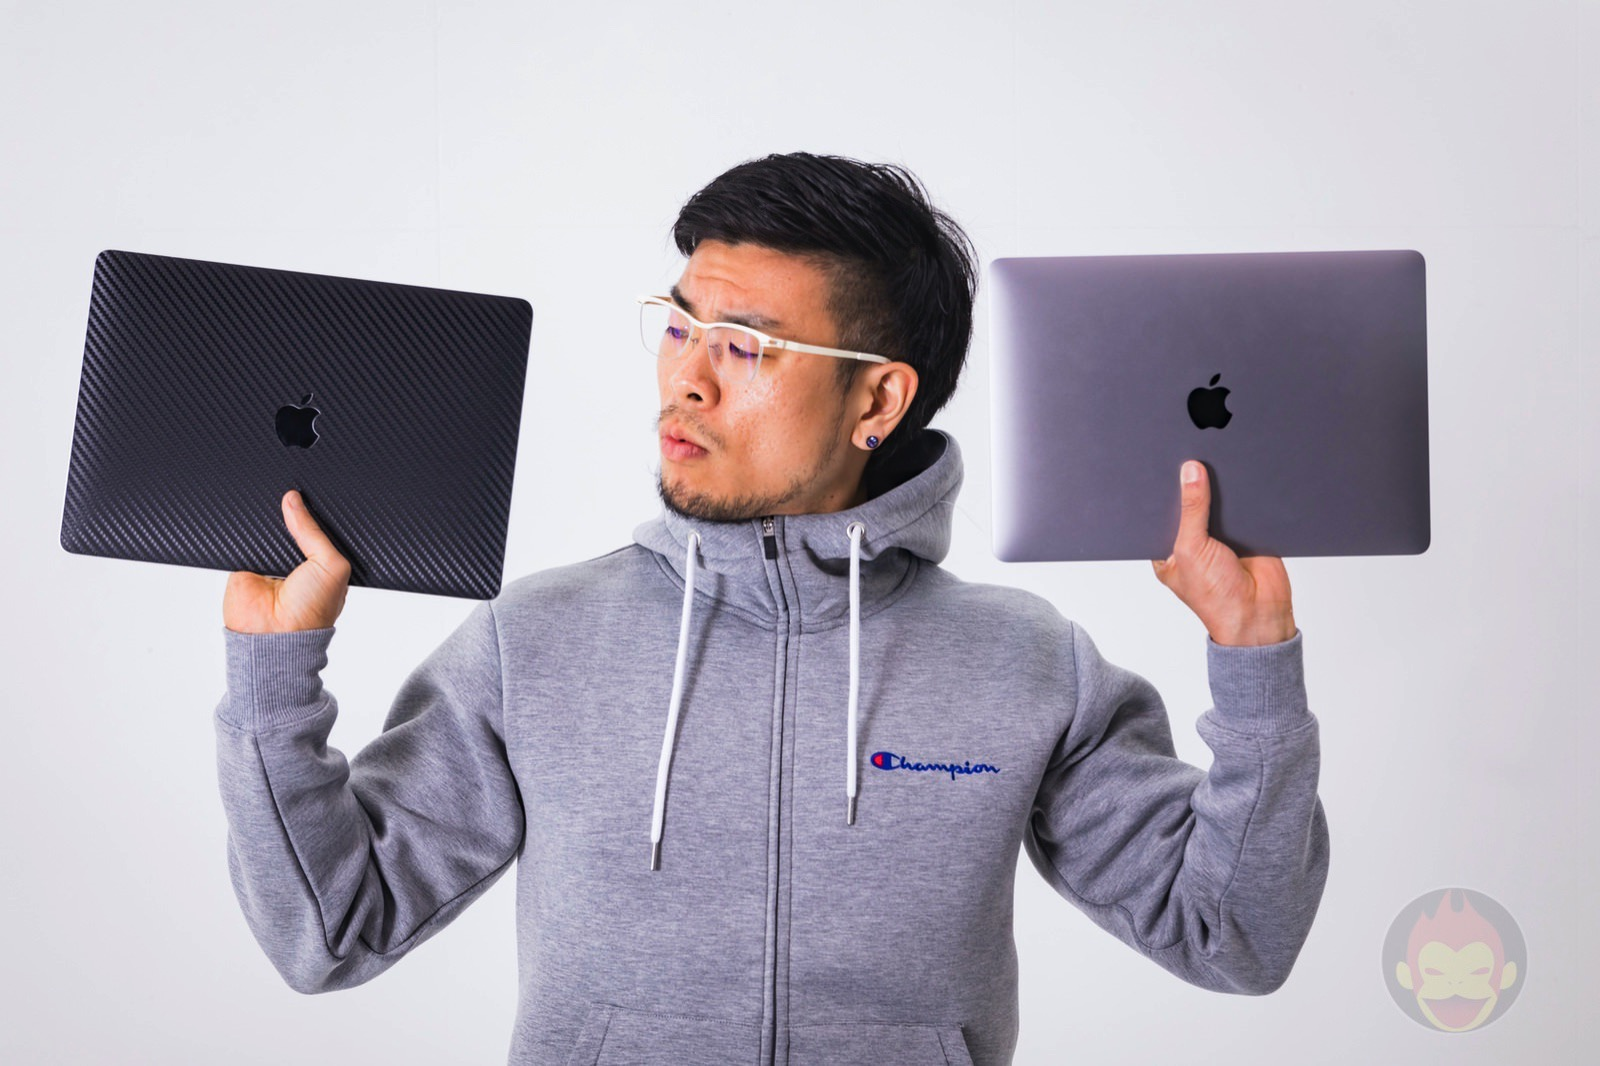 MacBook-Air-2018-Review-05.jpg